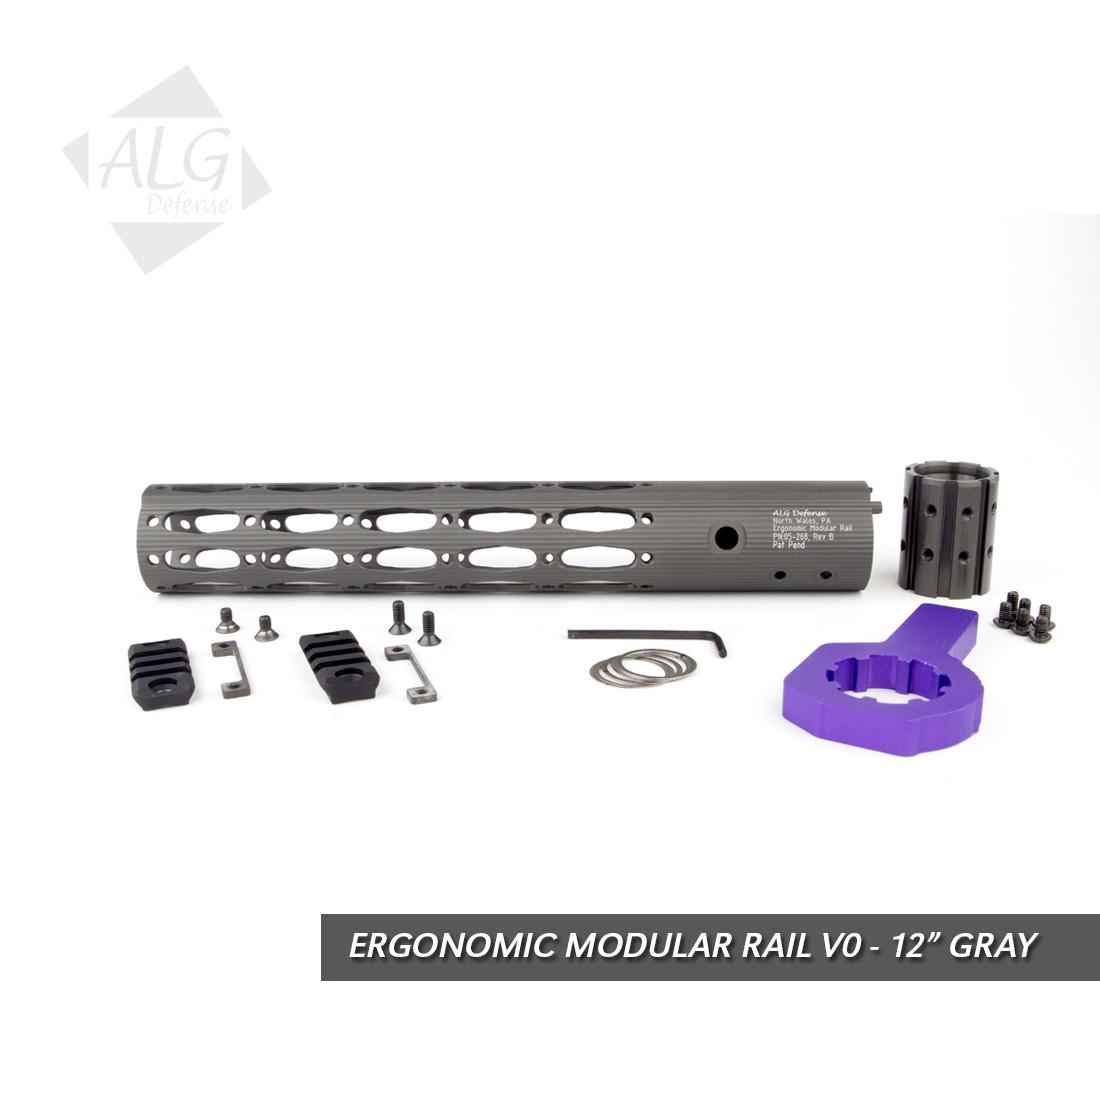 "ALG Defense Ergonomic Modular Rail 12"" (EMR) - V0"